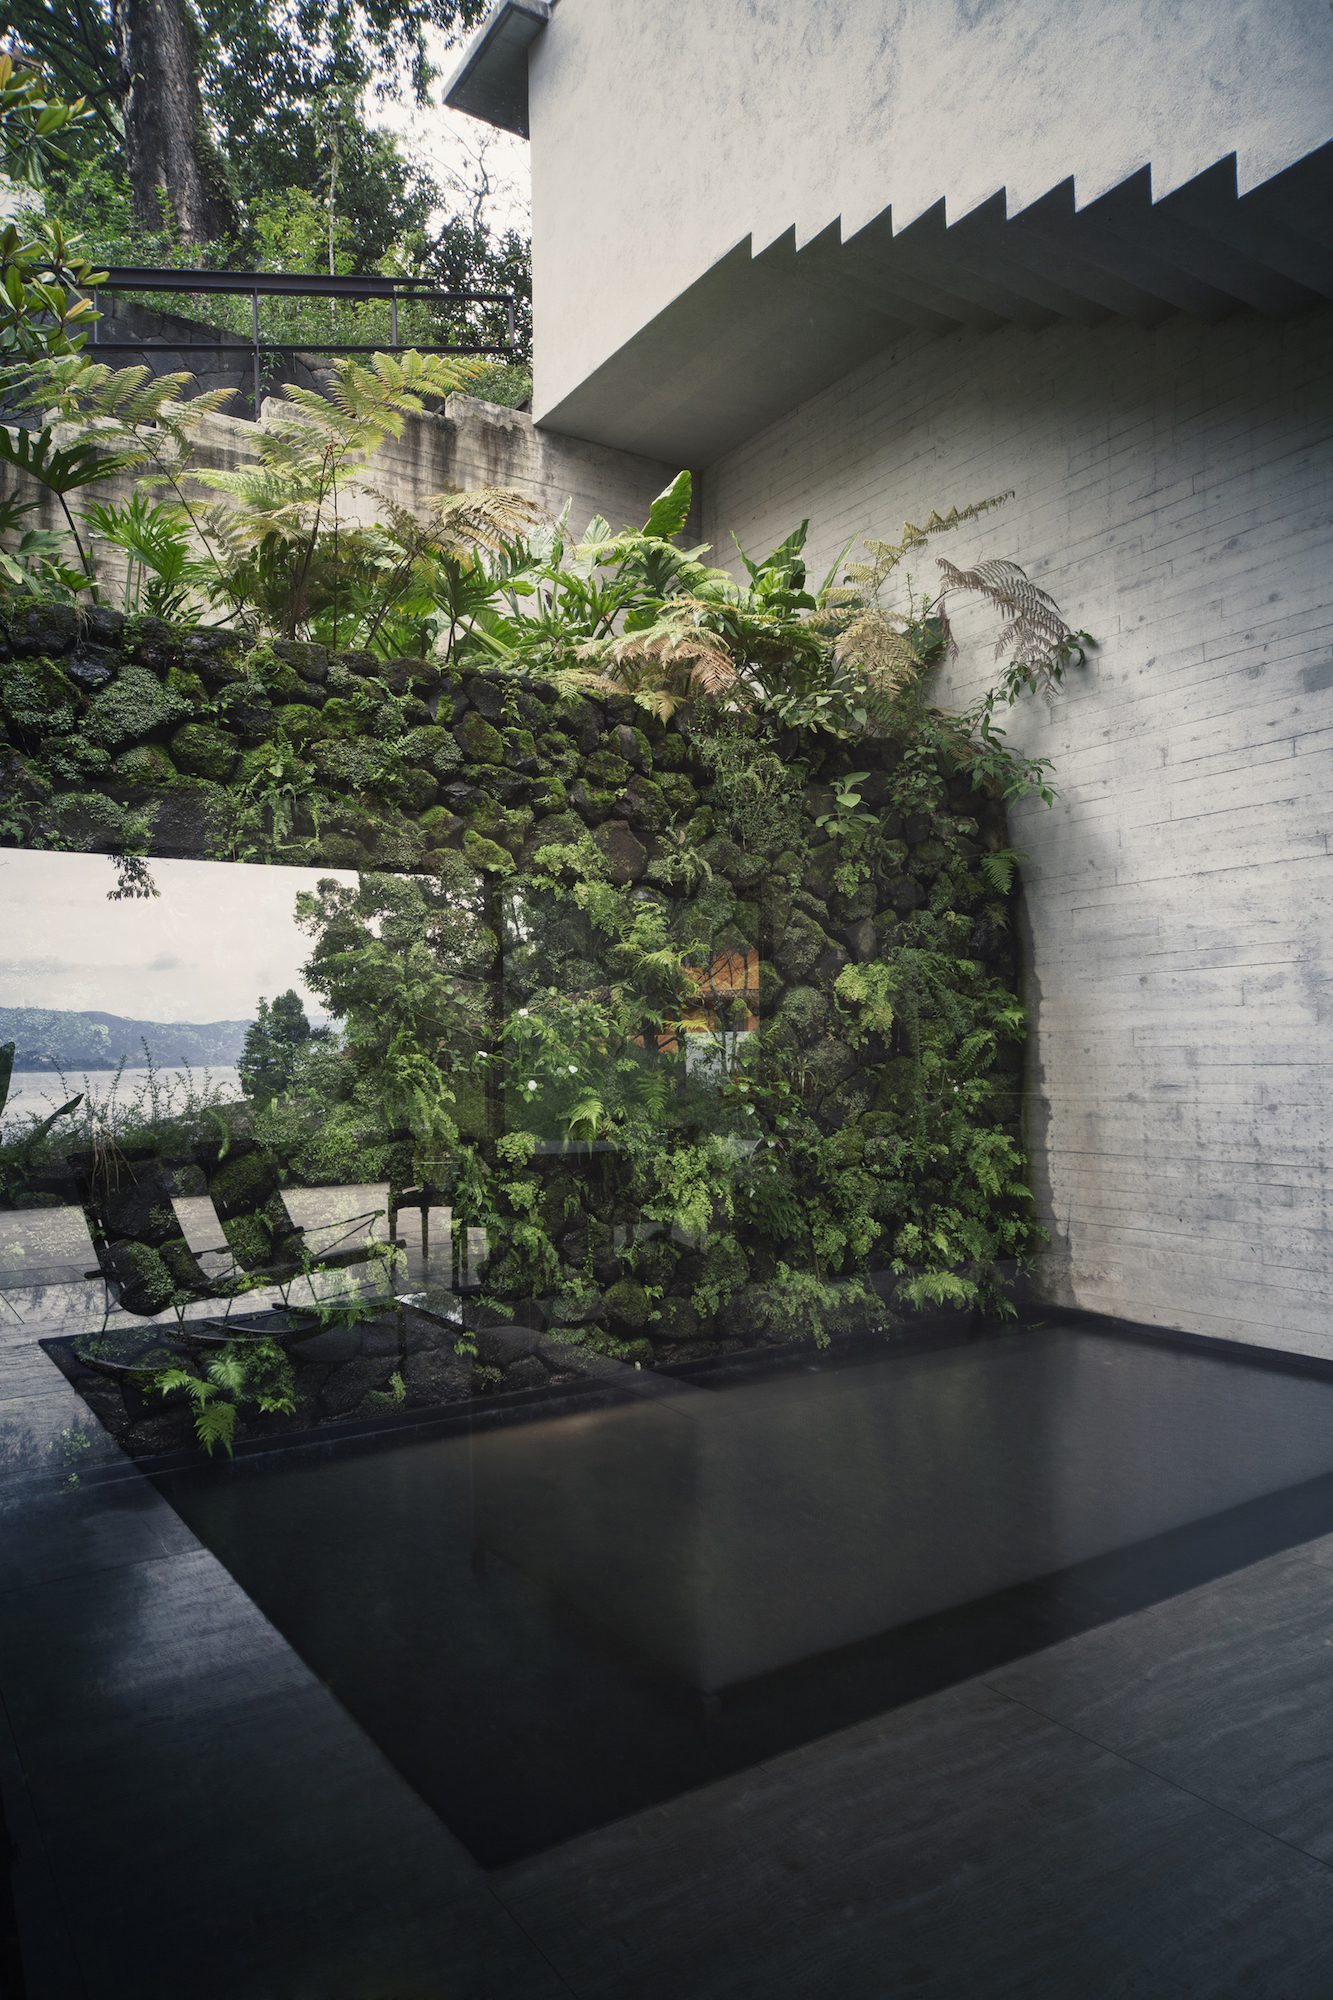 530eb460c07a80ed3b000150_house-maza-chk-arquitectura_2014_02_18_mz_fotos_yoshihiro_2280px_ancho_-7-